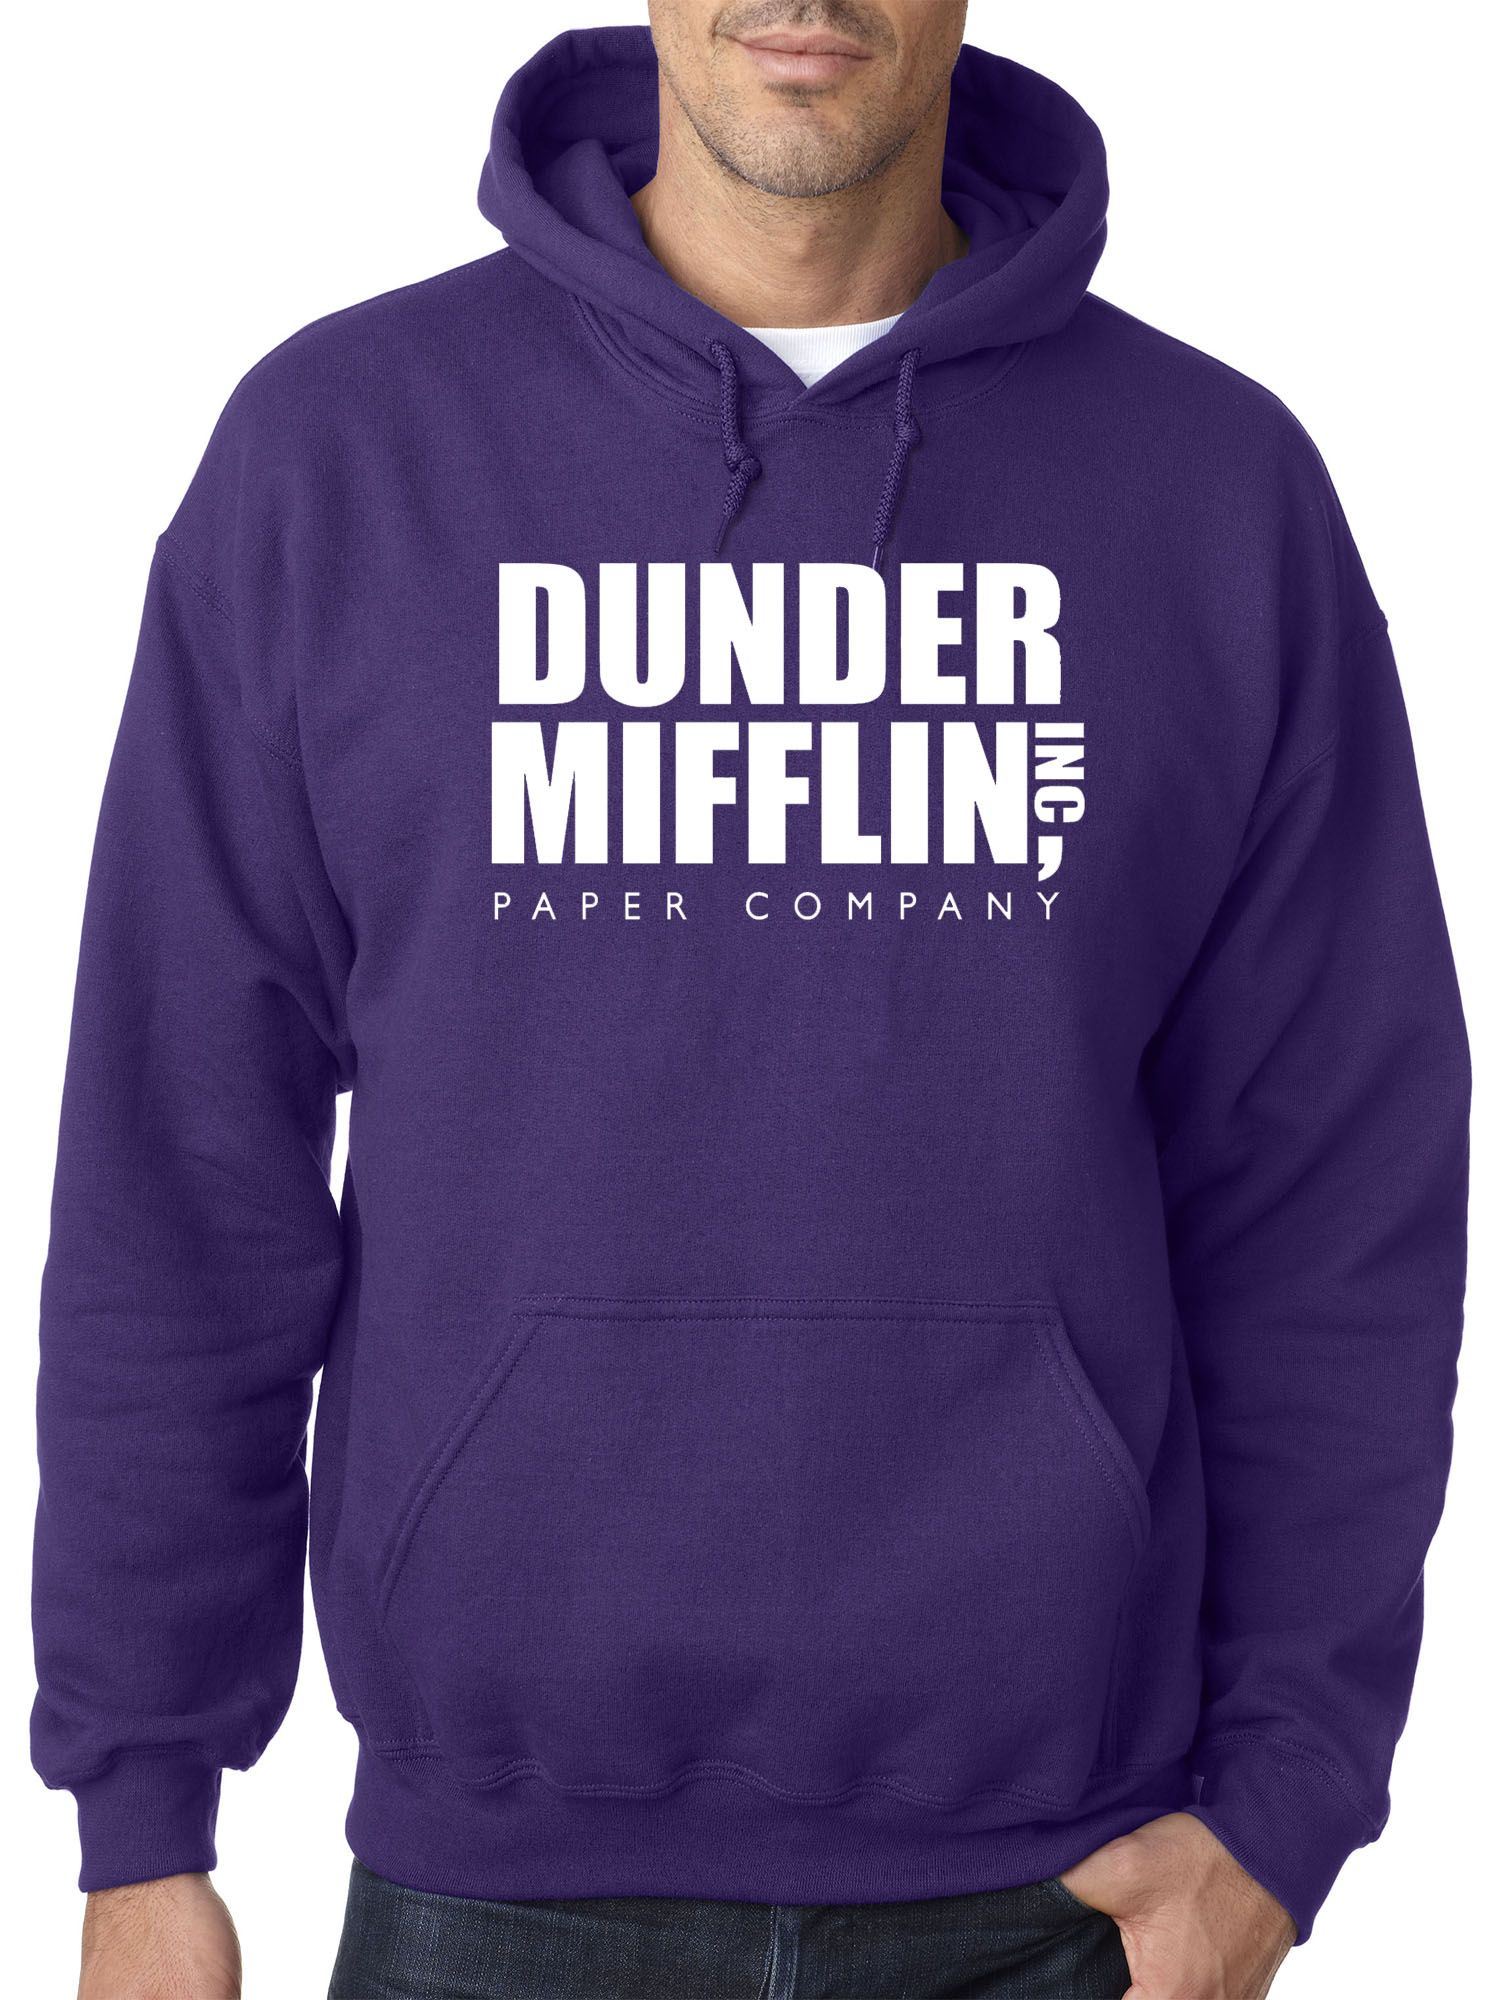 New Way 872 - Adult Hoodie Dunder Mifflin Inc Paper Company Office Logo Sweatshirt Small Red